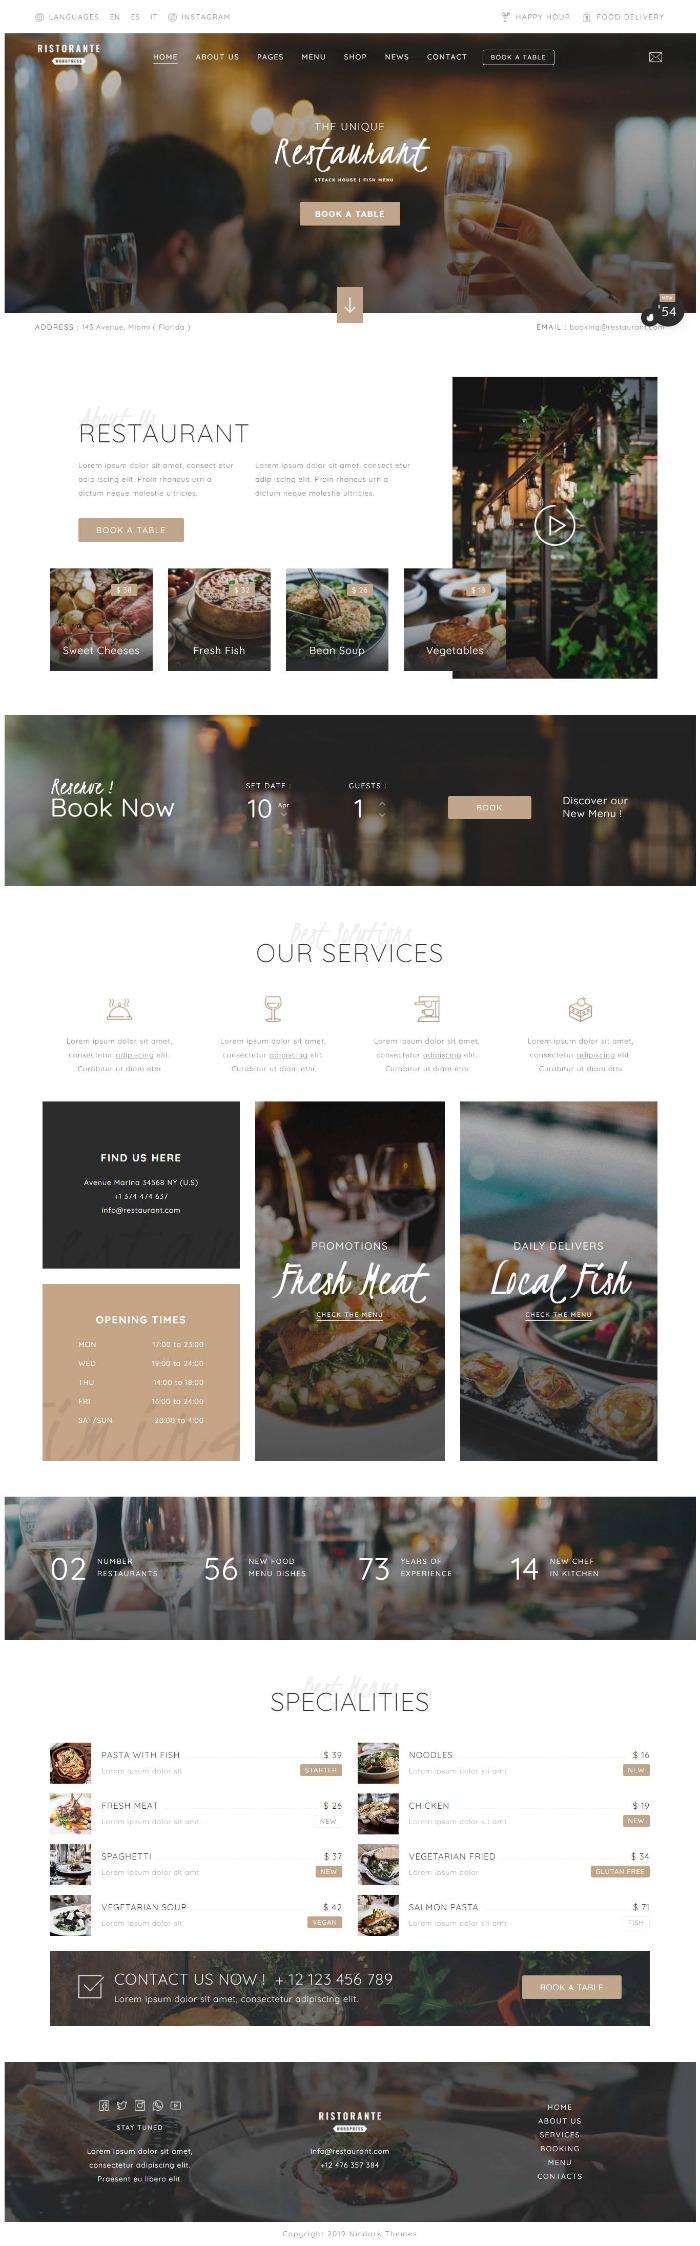 mau-website-nha-hang-ristorante